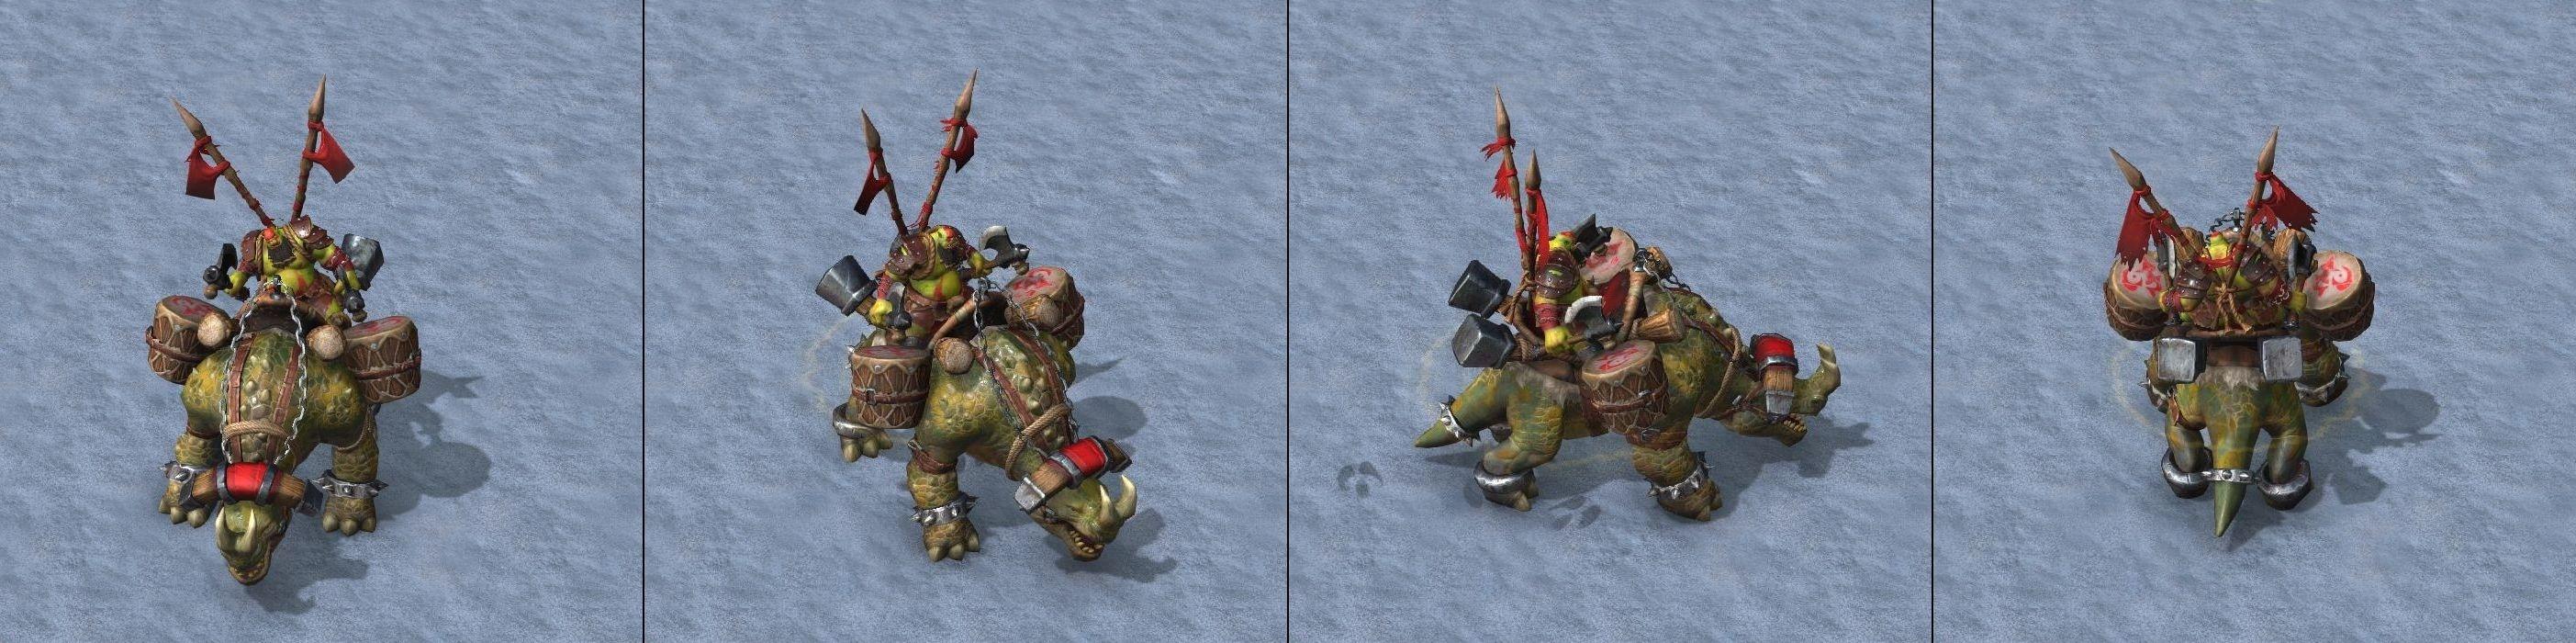 Warcraft III Reforged : Kodo Beast